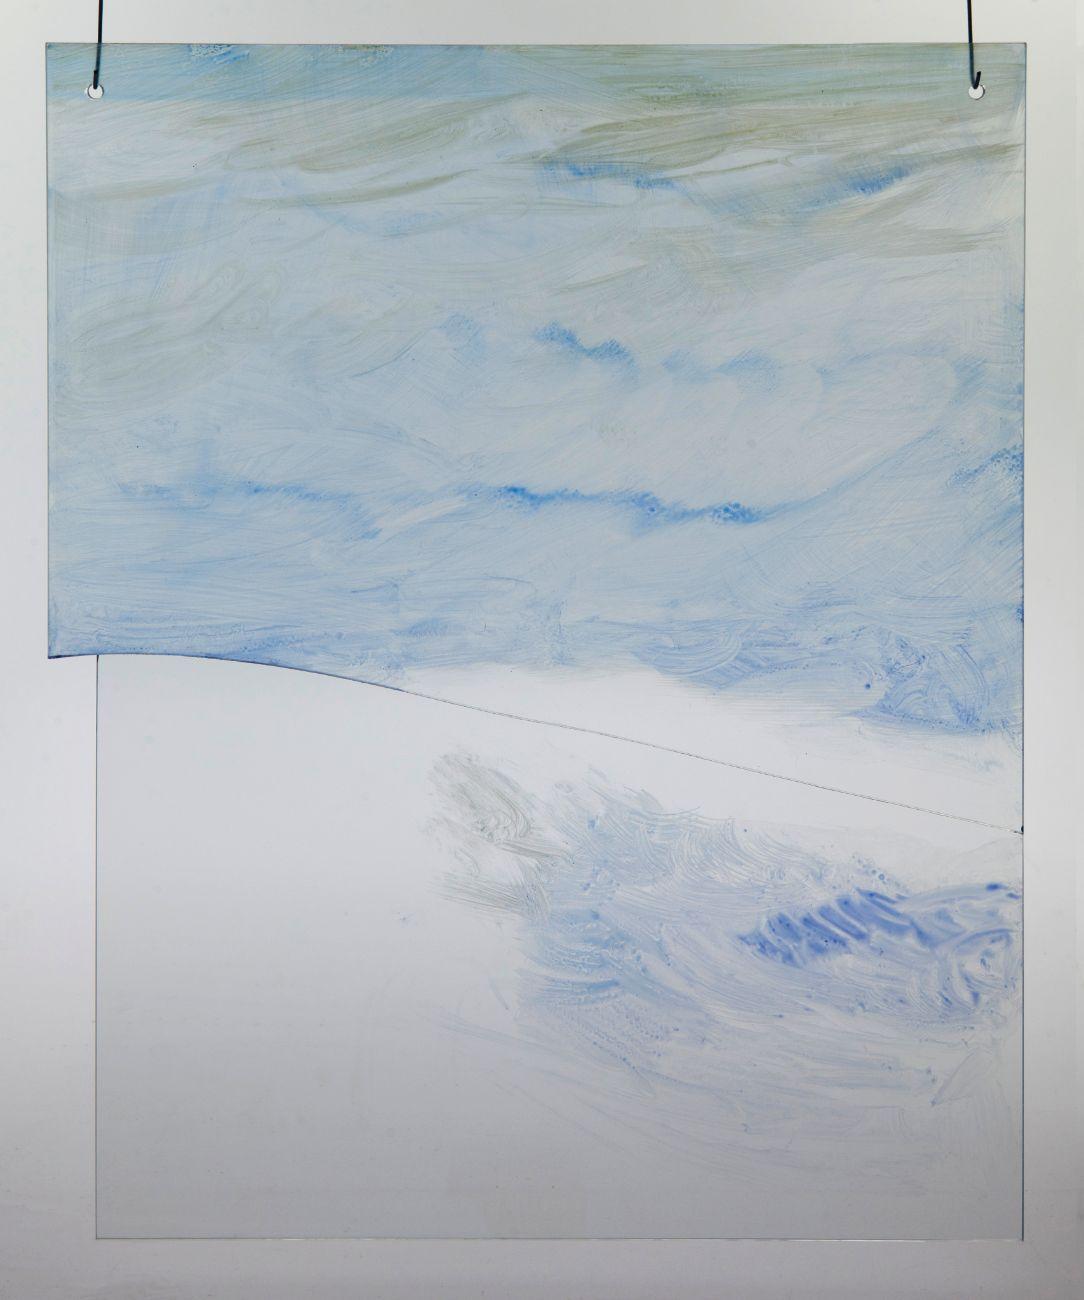 5, 40x50cm, maľba na skle, 2018